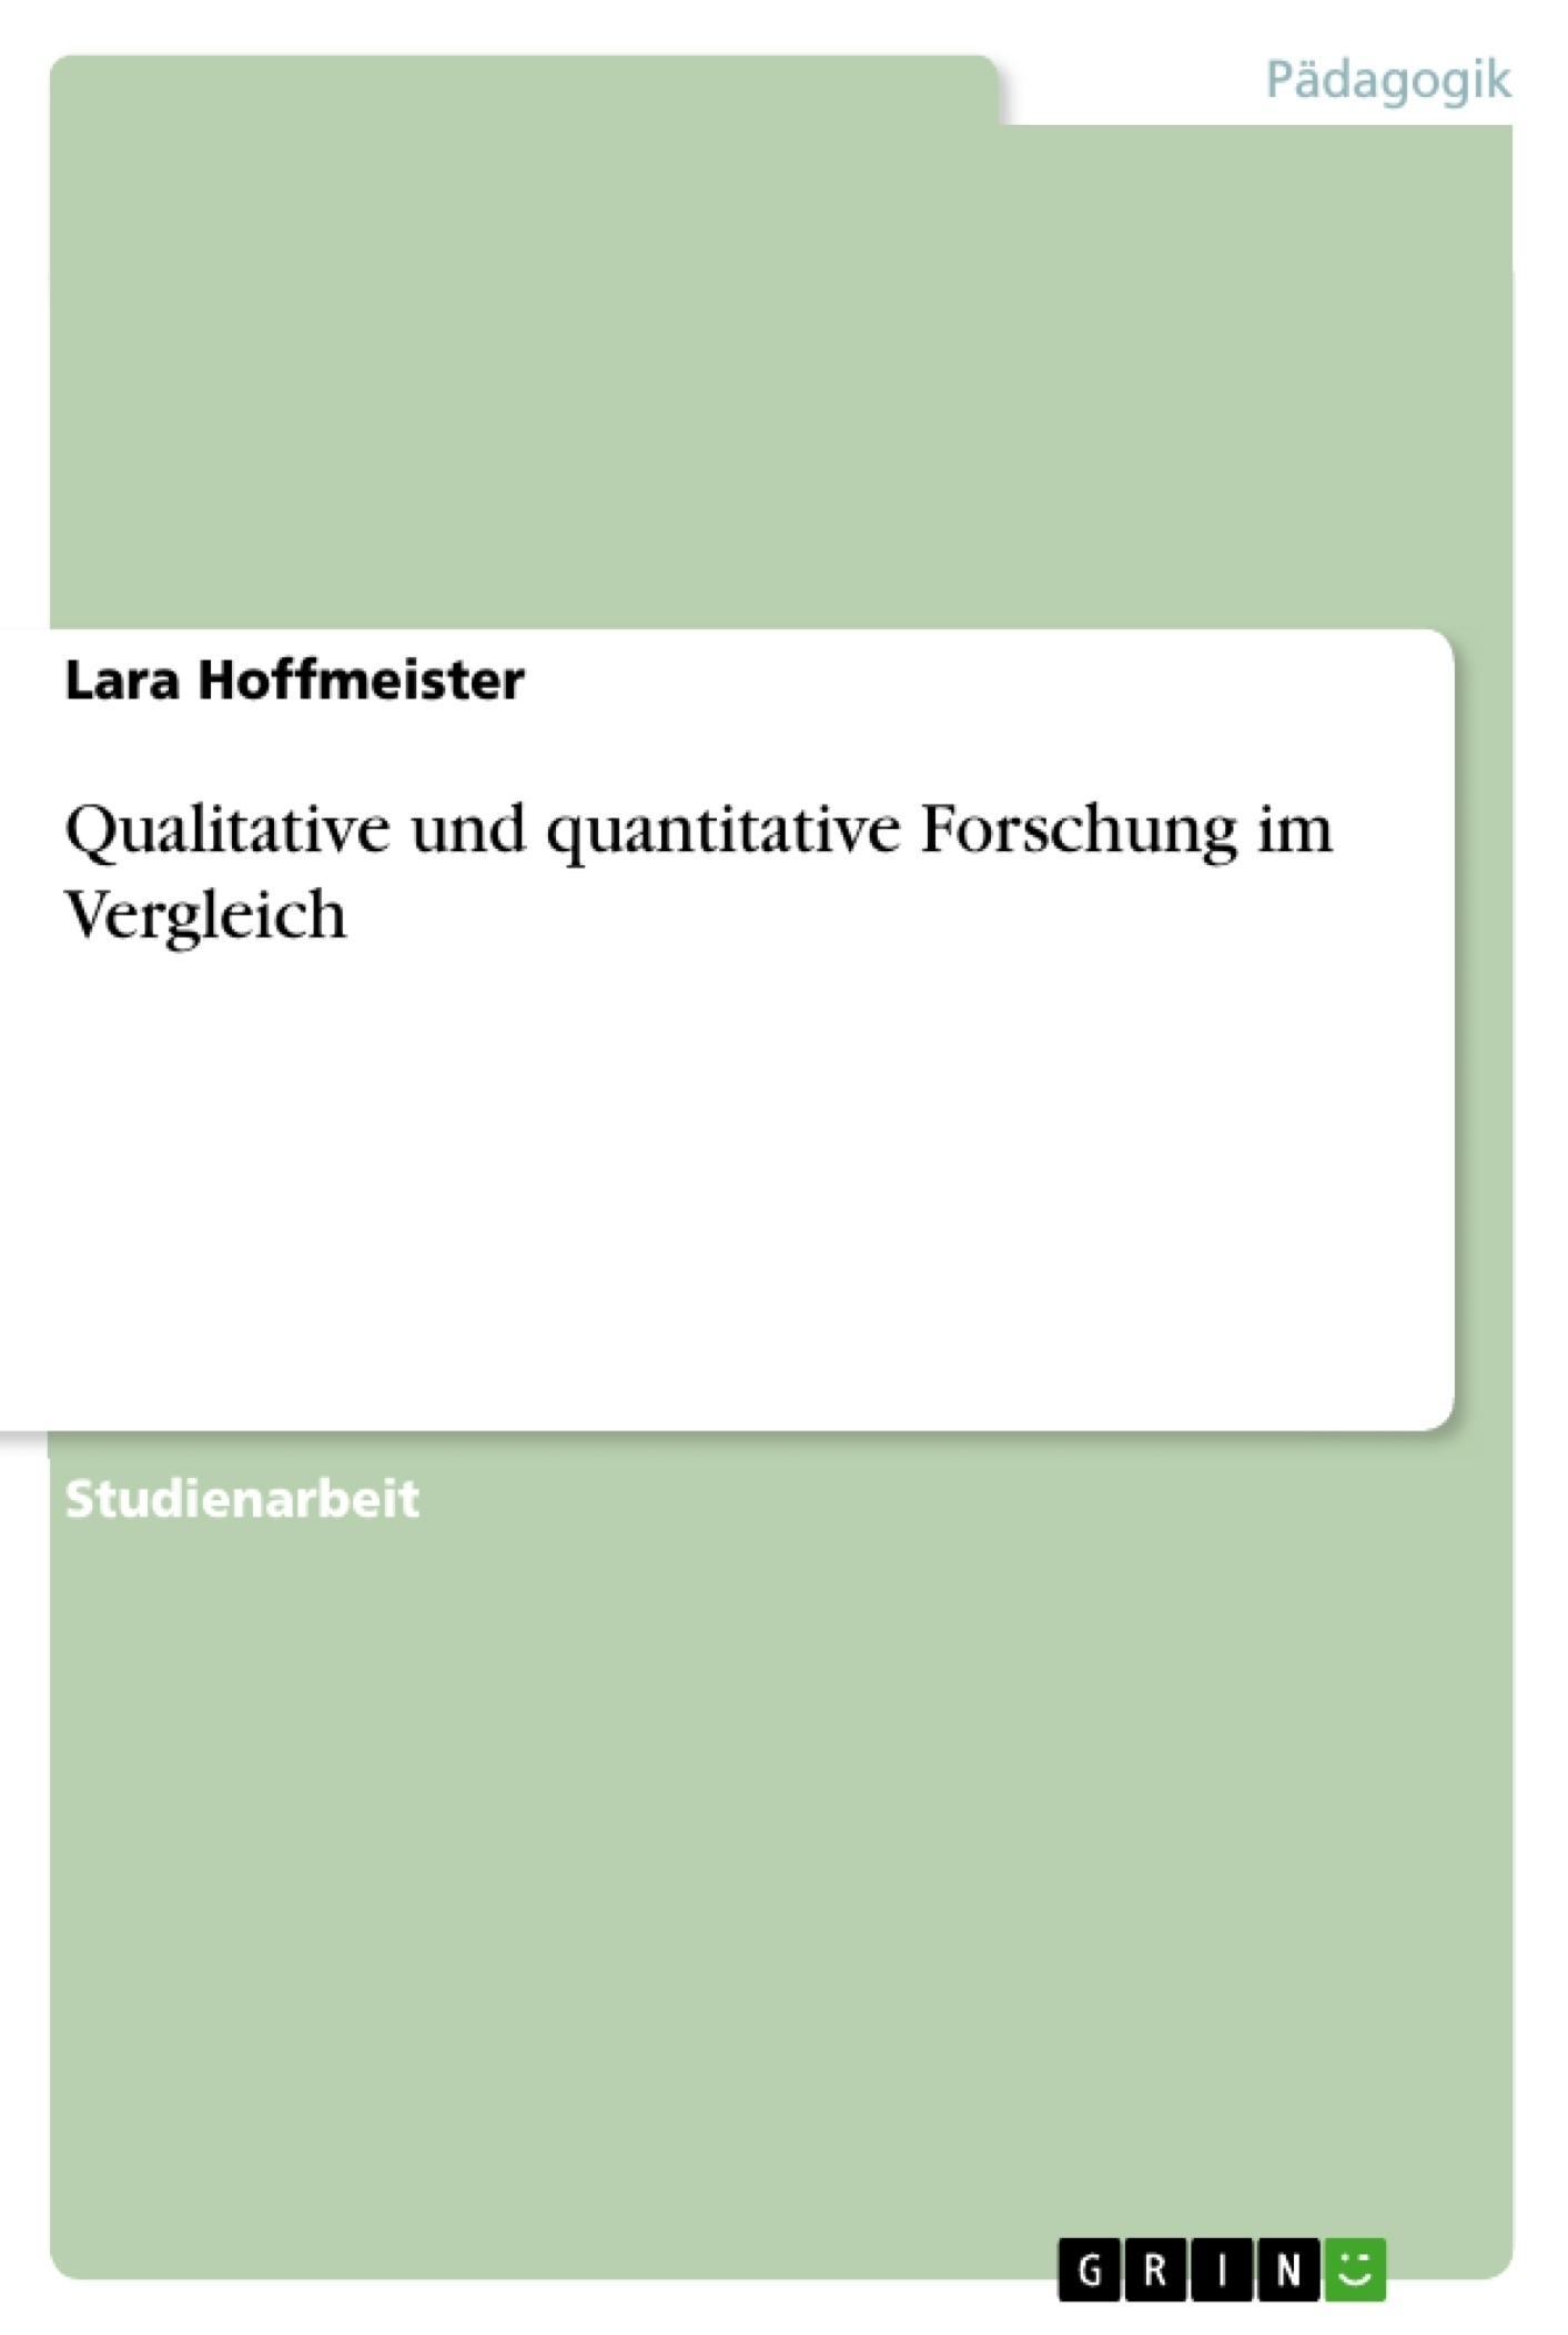 Titel: Qualitative und quantitative Forschung im Vergleich